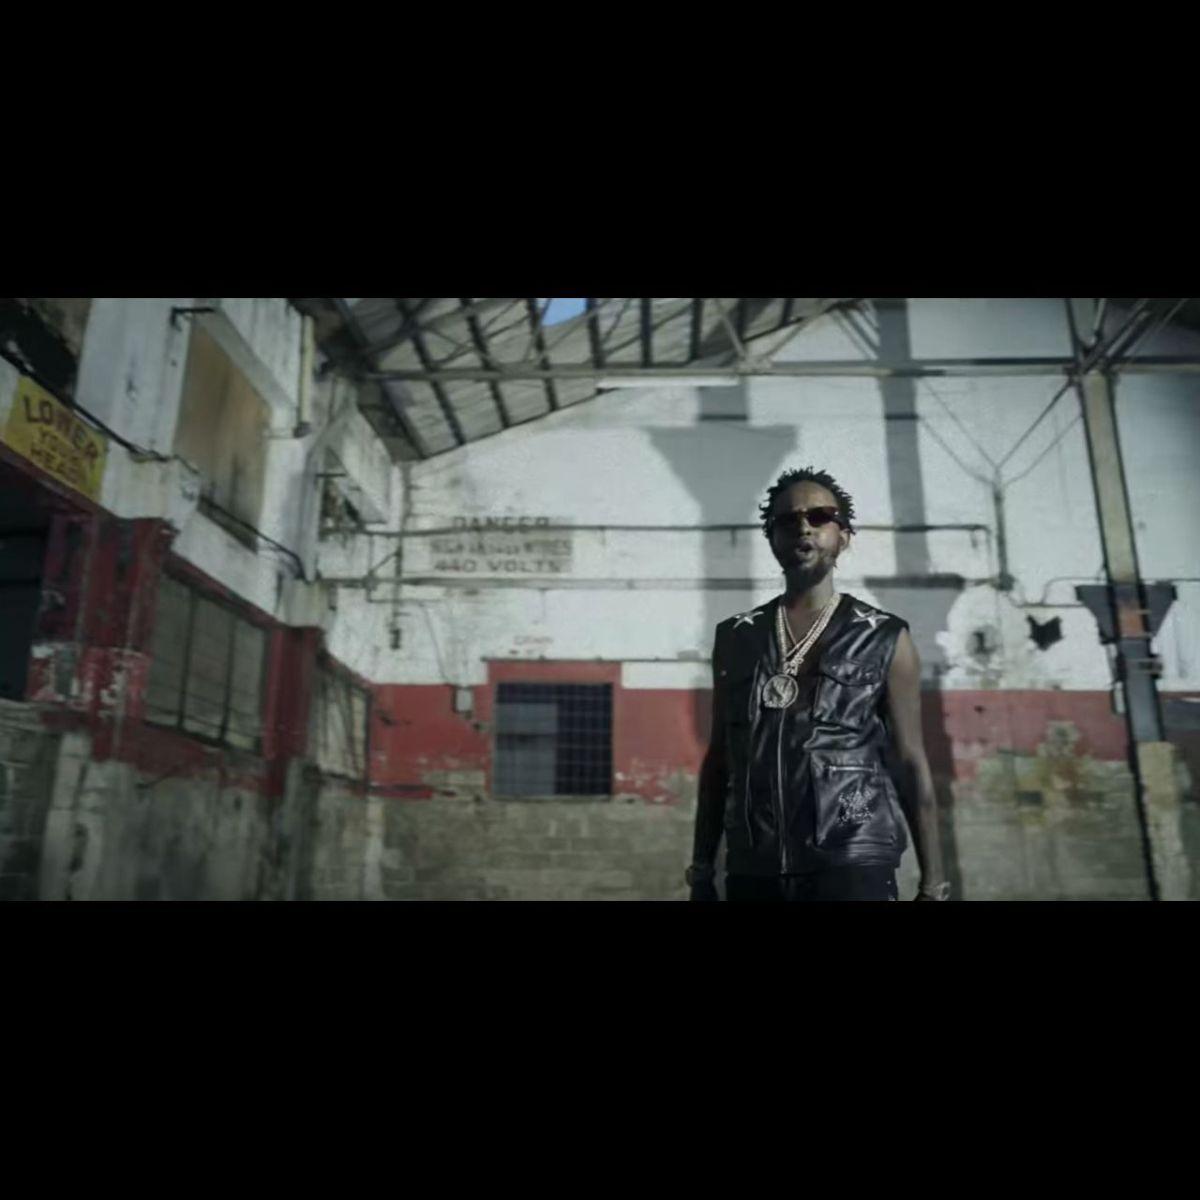 Popcaan - Unda Dirt (ft. Masicka and Tommy Lee) (Thumbnail)